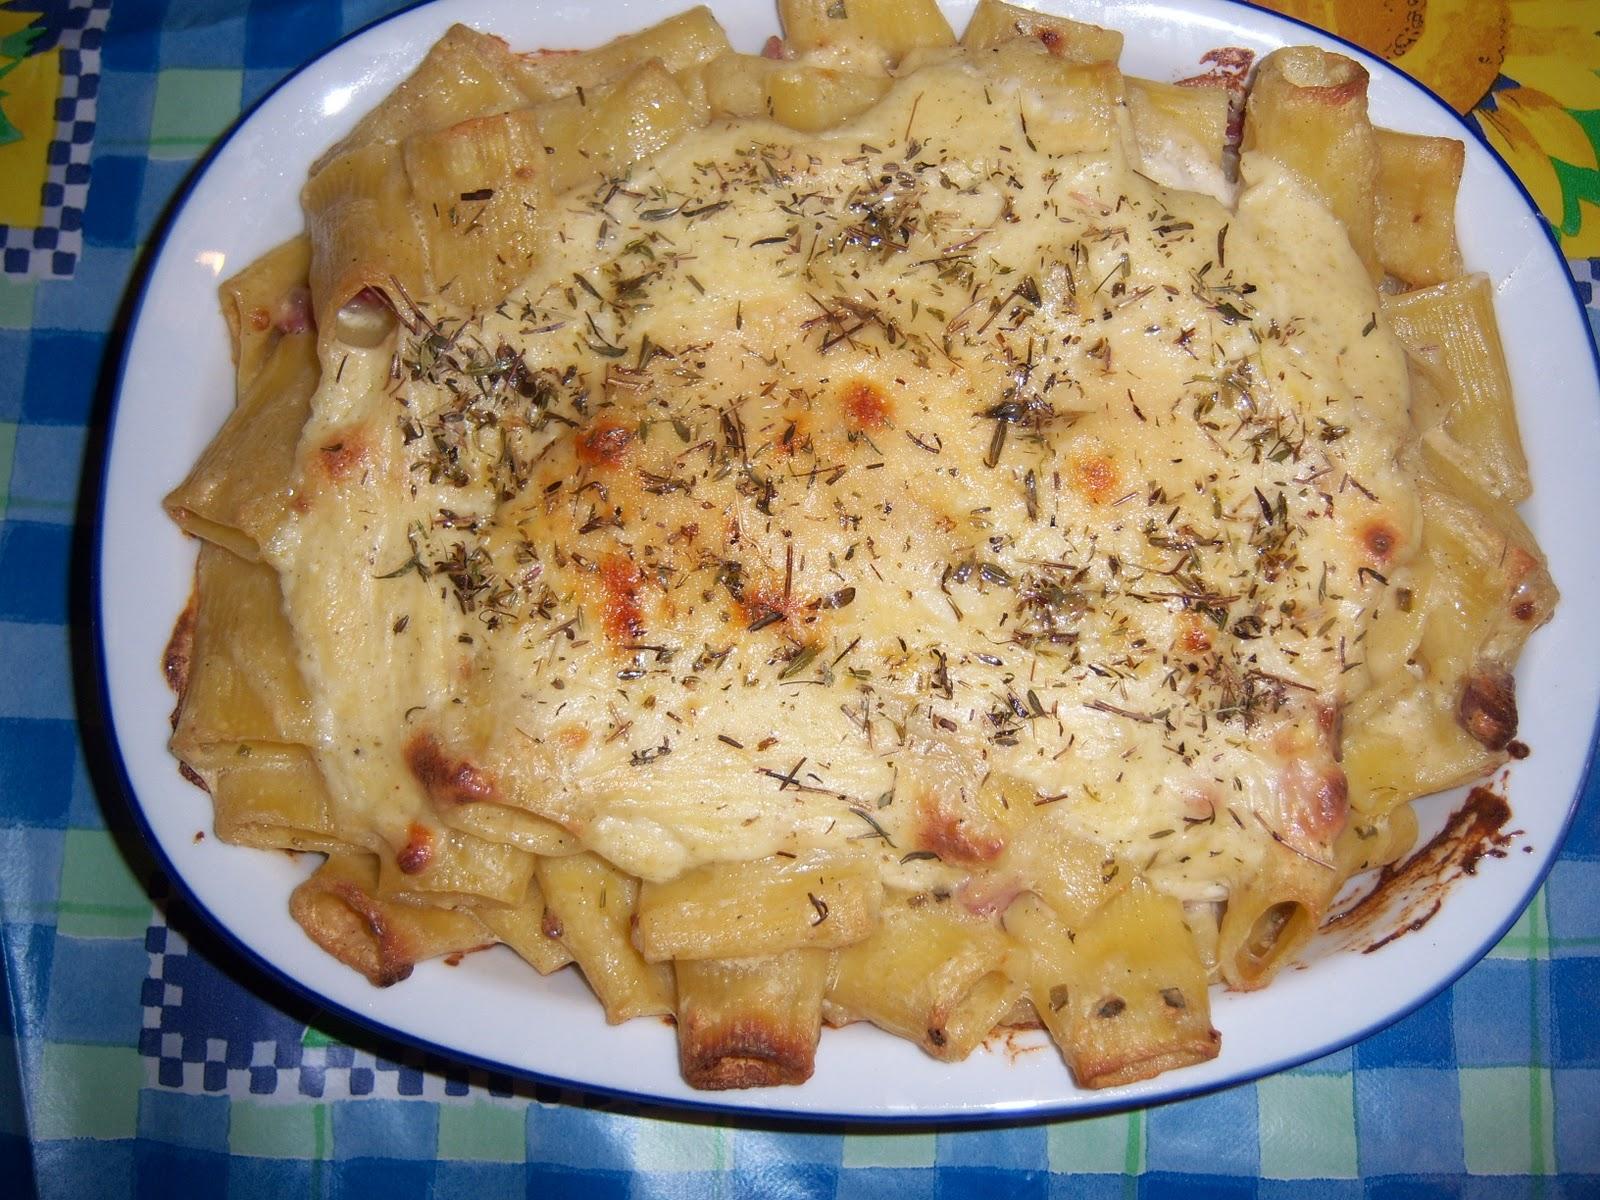 Ricette on line maccheroni al forno gustosi for Ricette on line